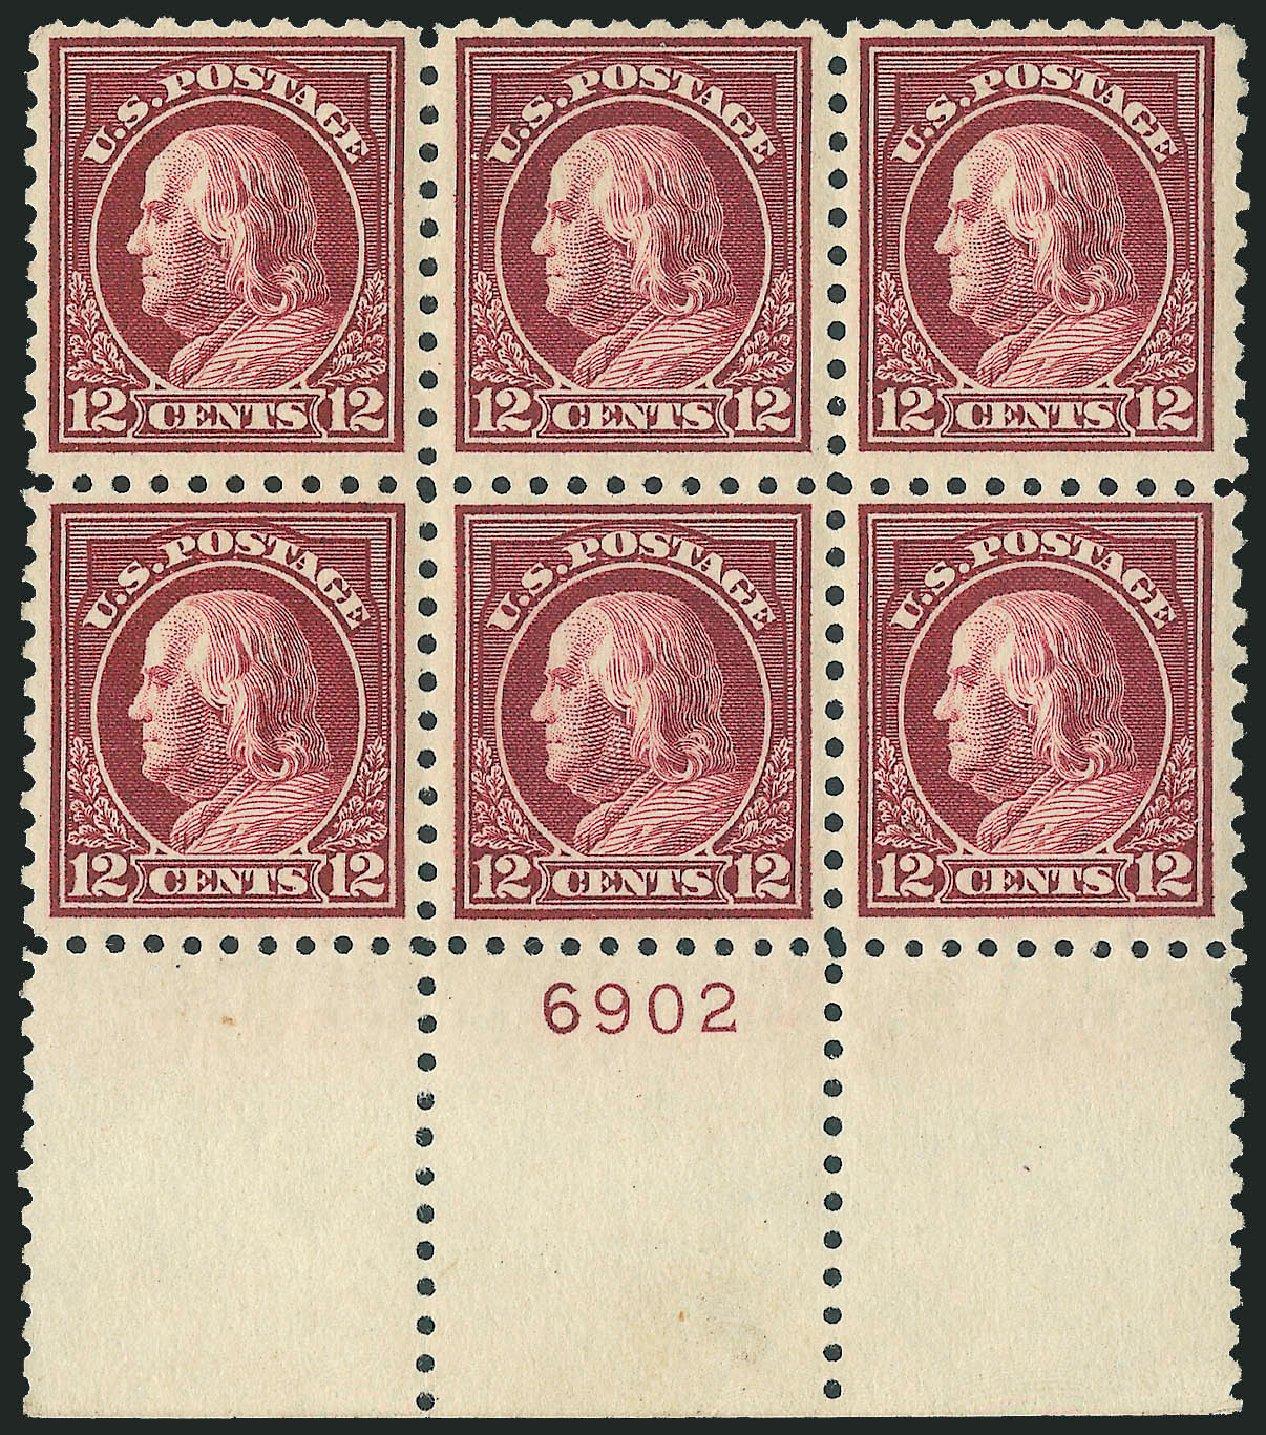 US Stamp Prices Scott Catalog # 474 - 12c 1916 Franklin Perf 10. Robert Siegel Auction Galleries, Mar 2013, Sale 1040, Lot 1855